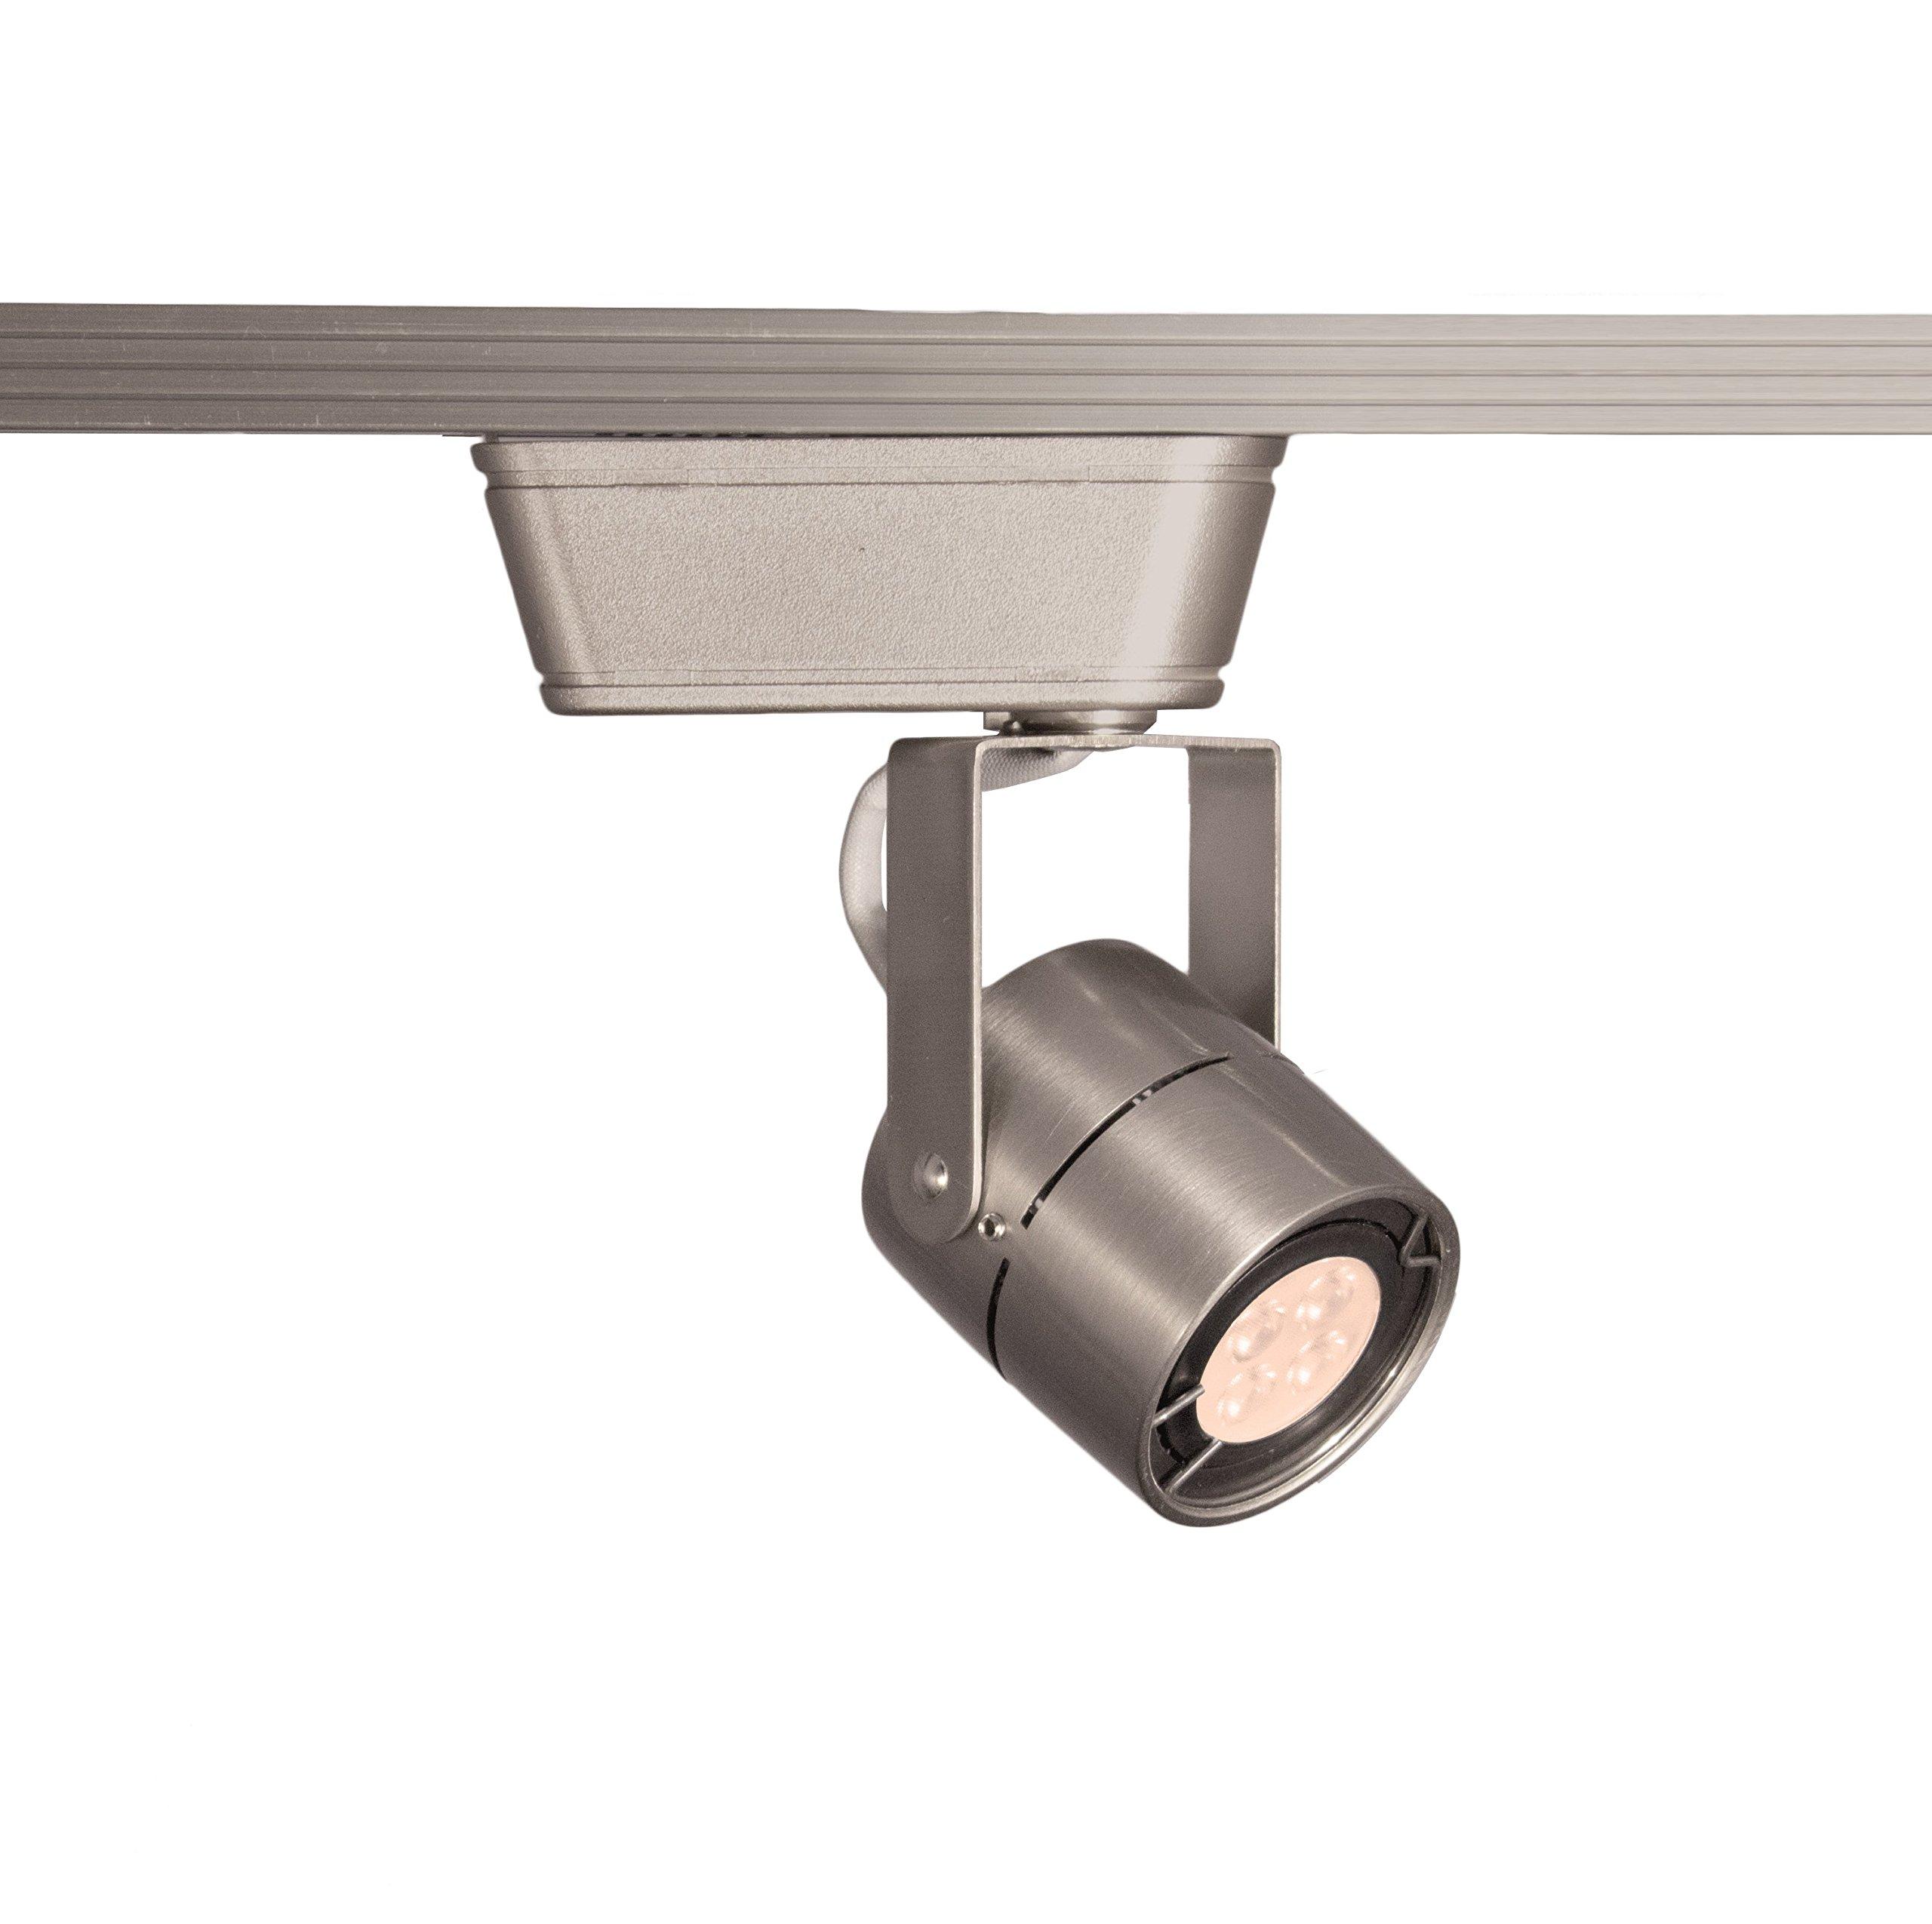 WAC Lighting HHT-809LED-BN Low Voltage 120V Luminaire H Track